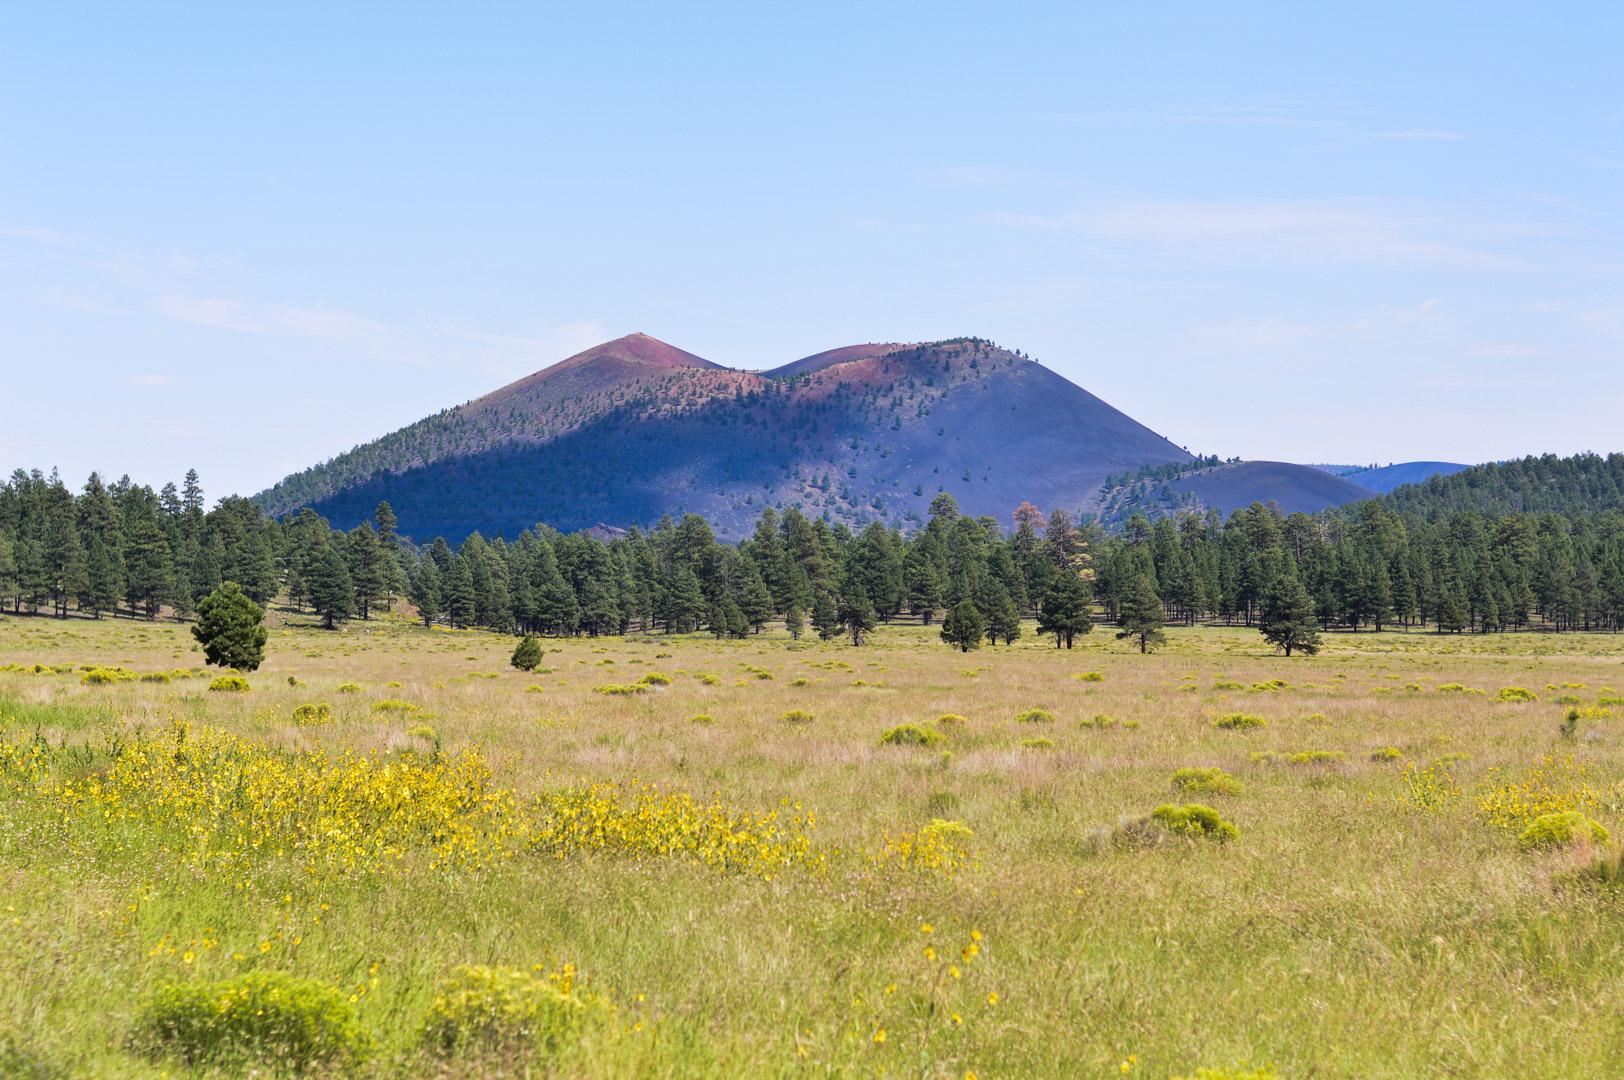 travel-blogger-arizona-long-weekend-itinerary-sunset-crater-volcano 2